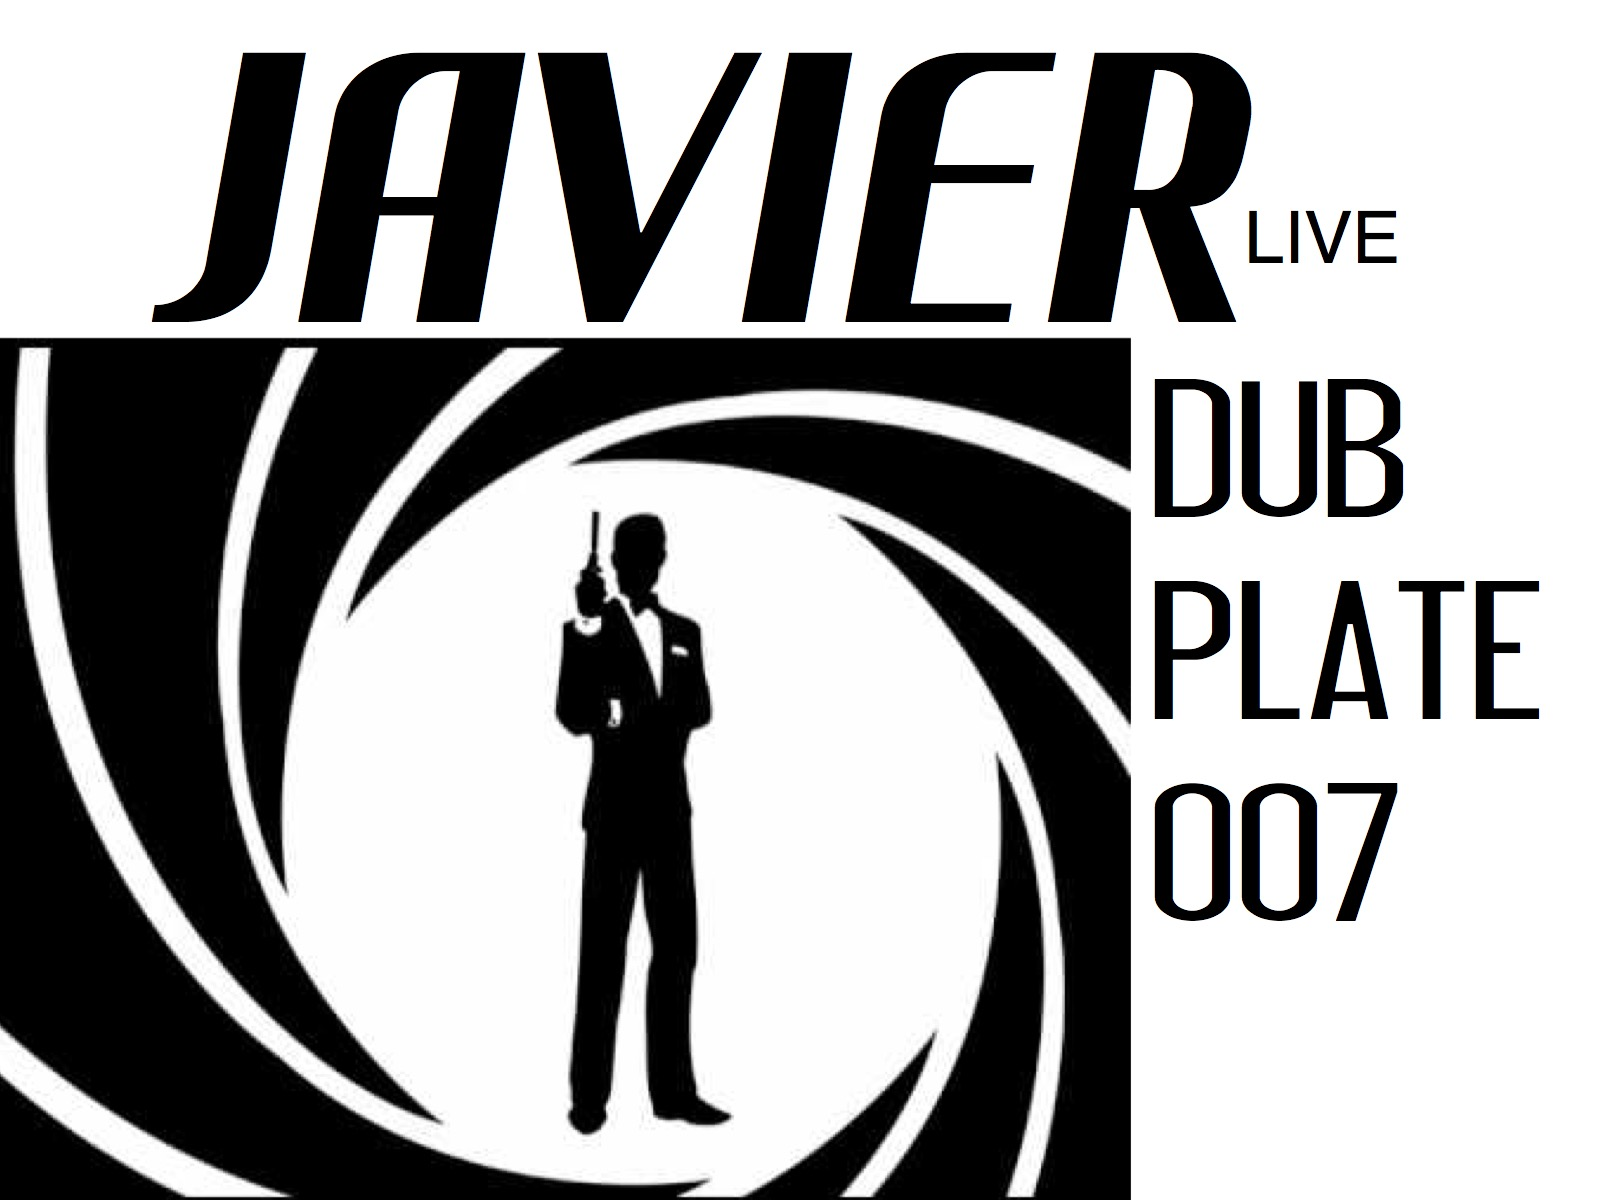 JAVIER 007 SPECIAL REAKTOR OPS AGENT DNB GOSU 00 48 46 7 FRUIT DEALER